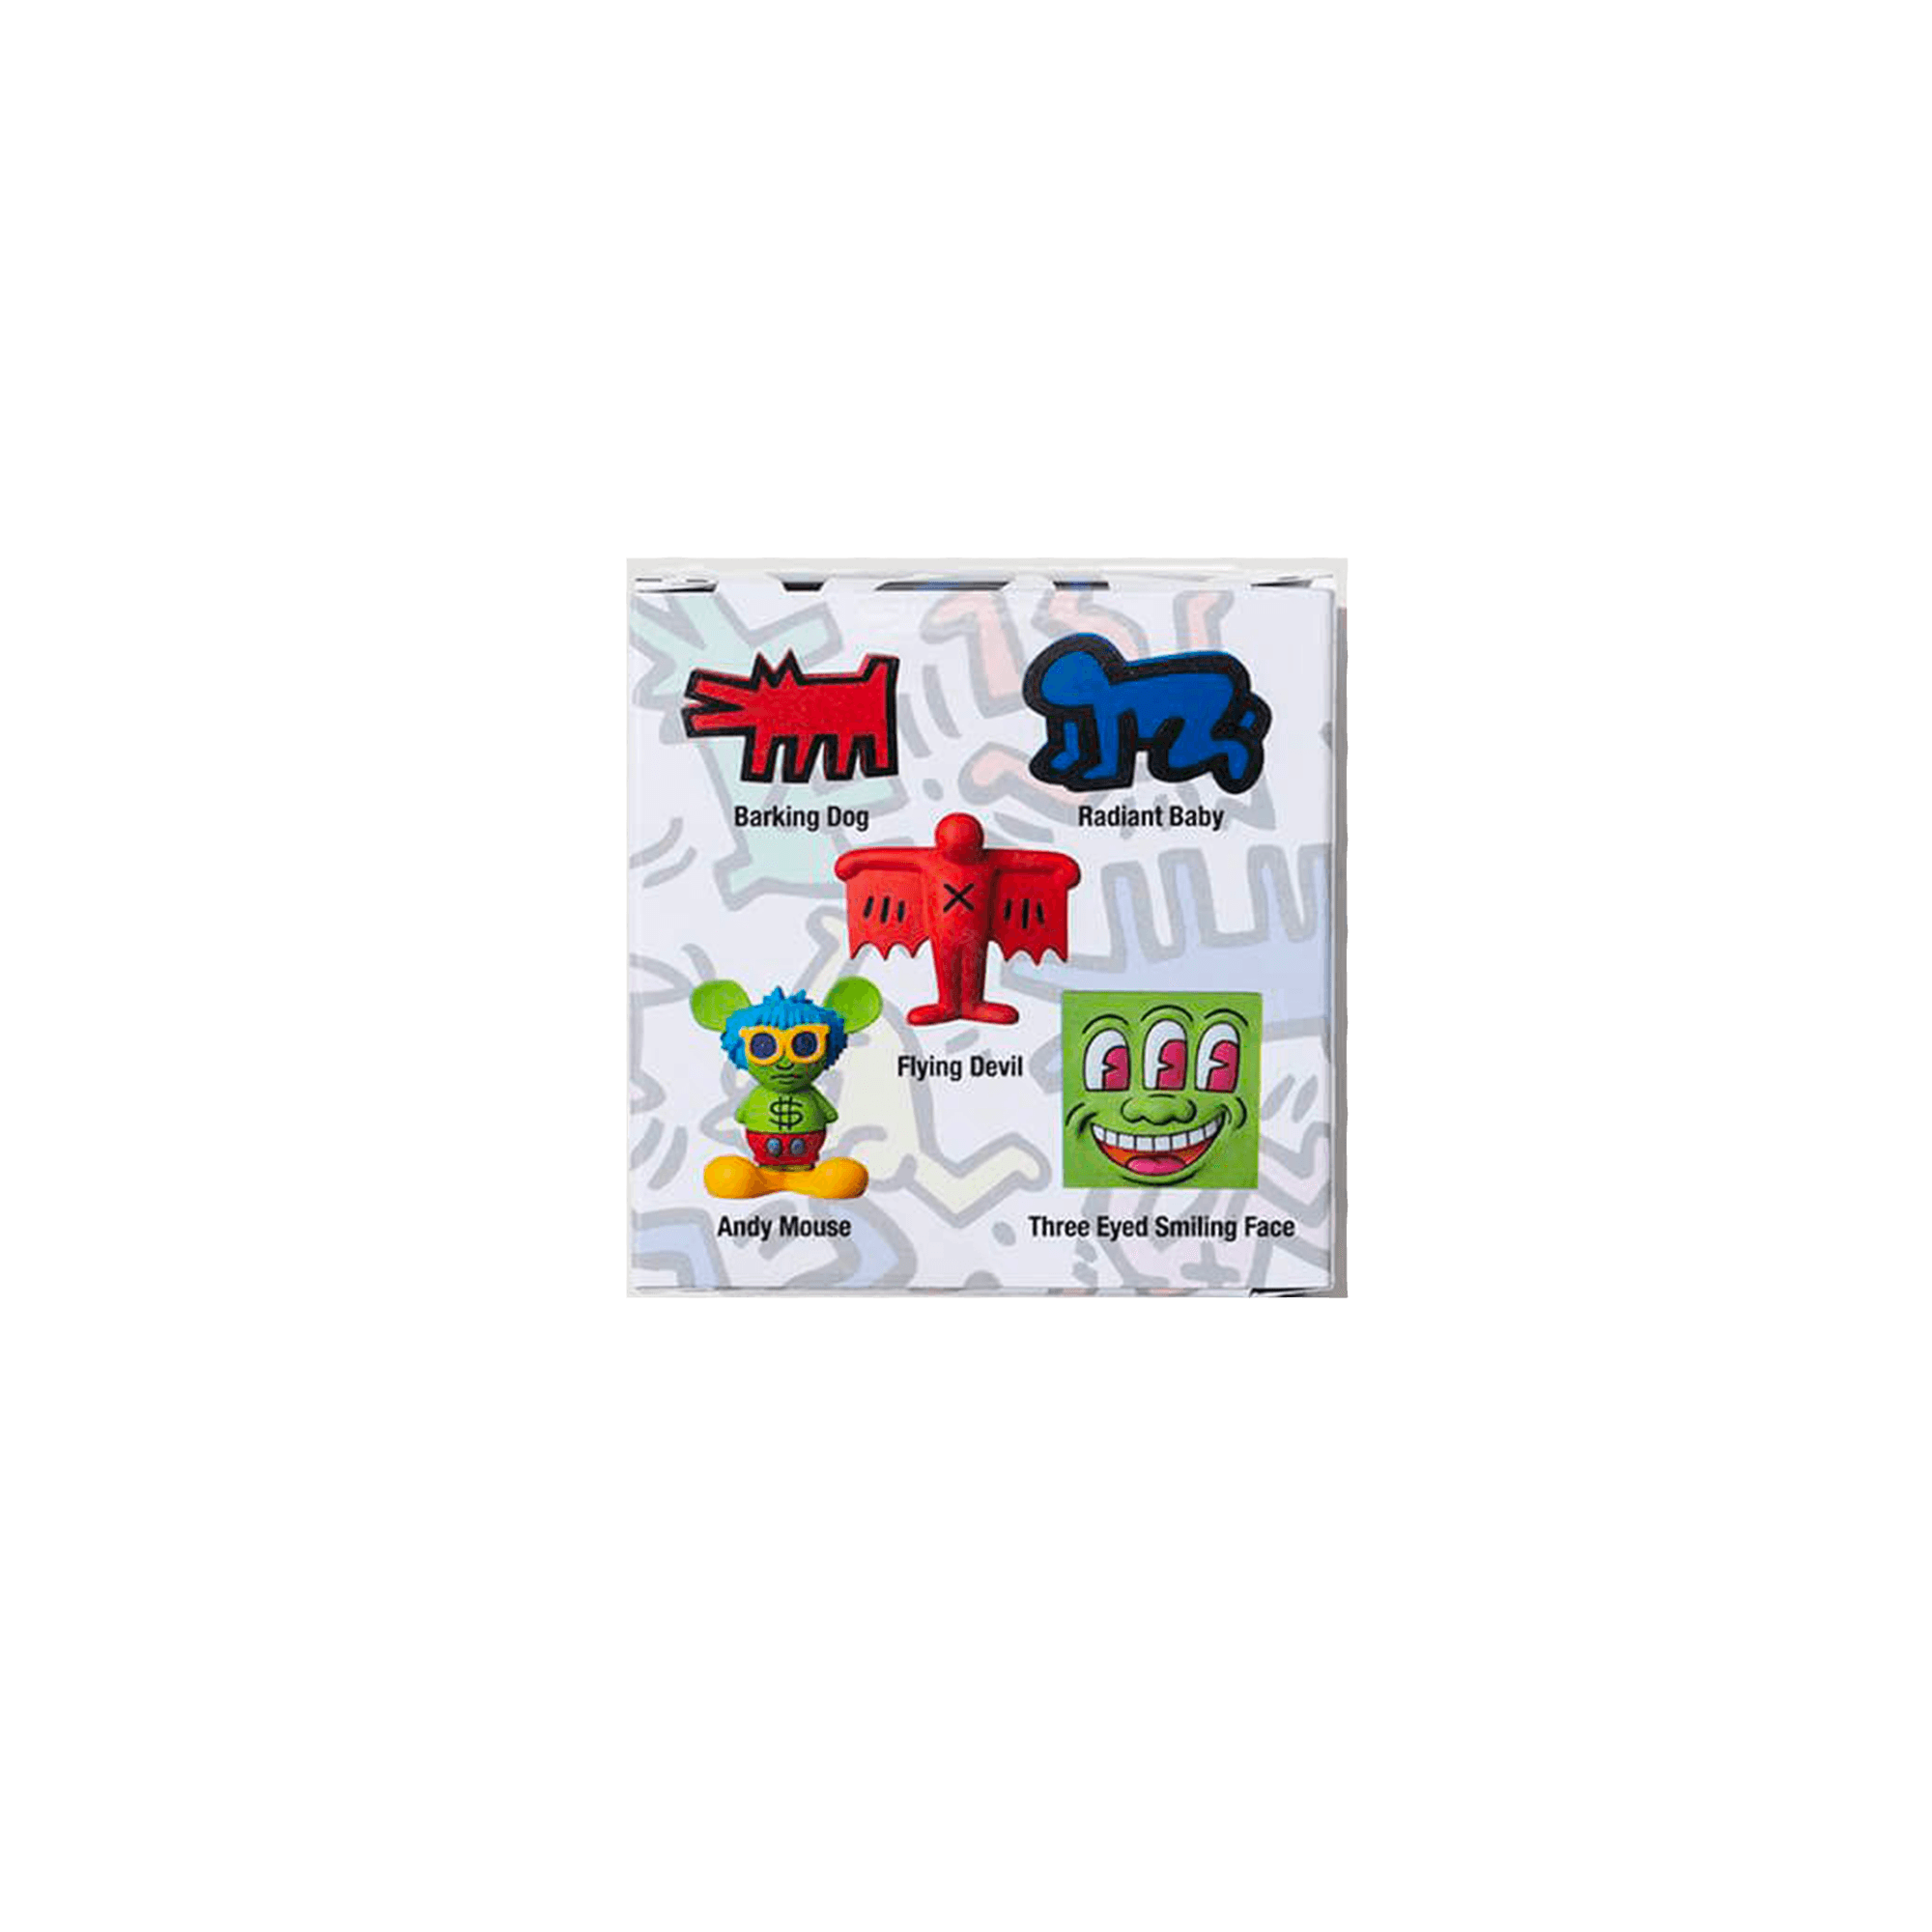 Mini VCD x keith Haring multicolor